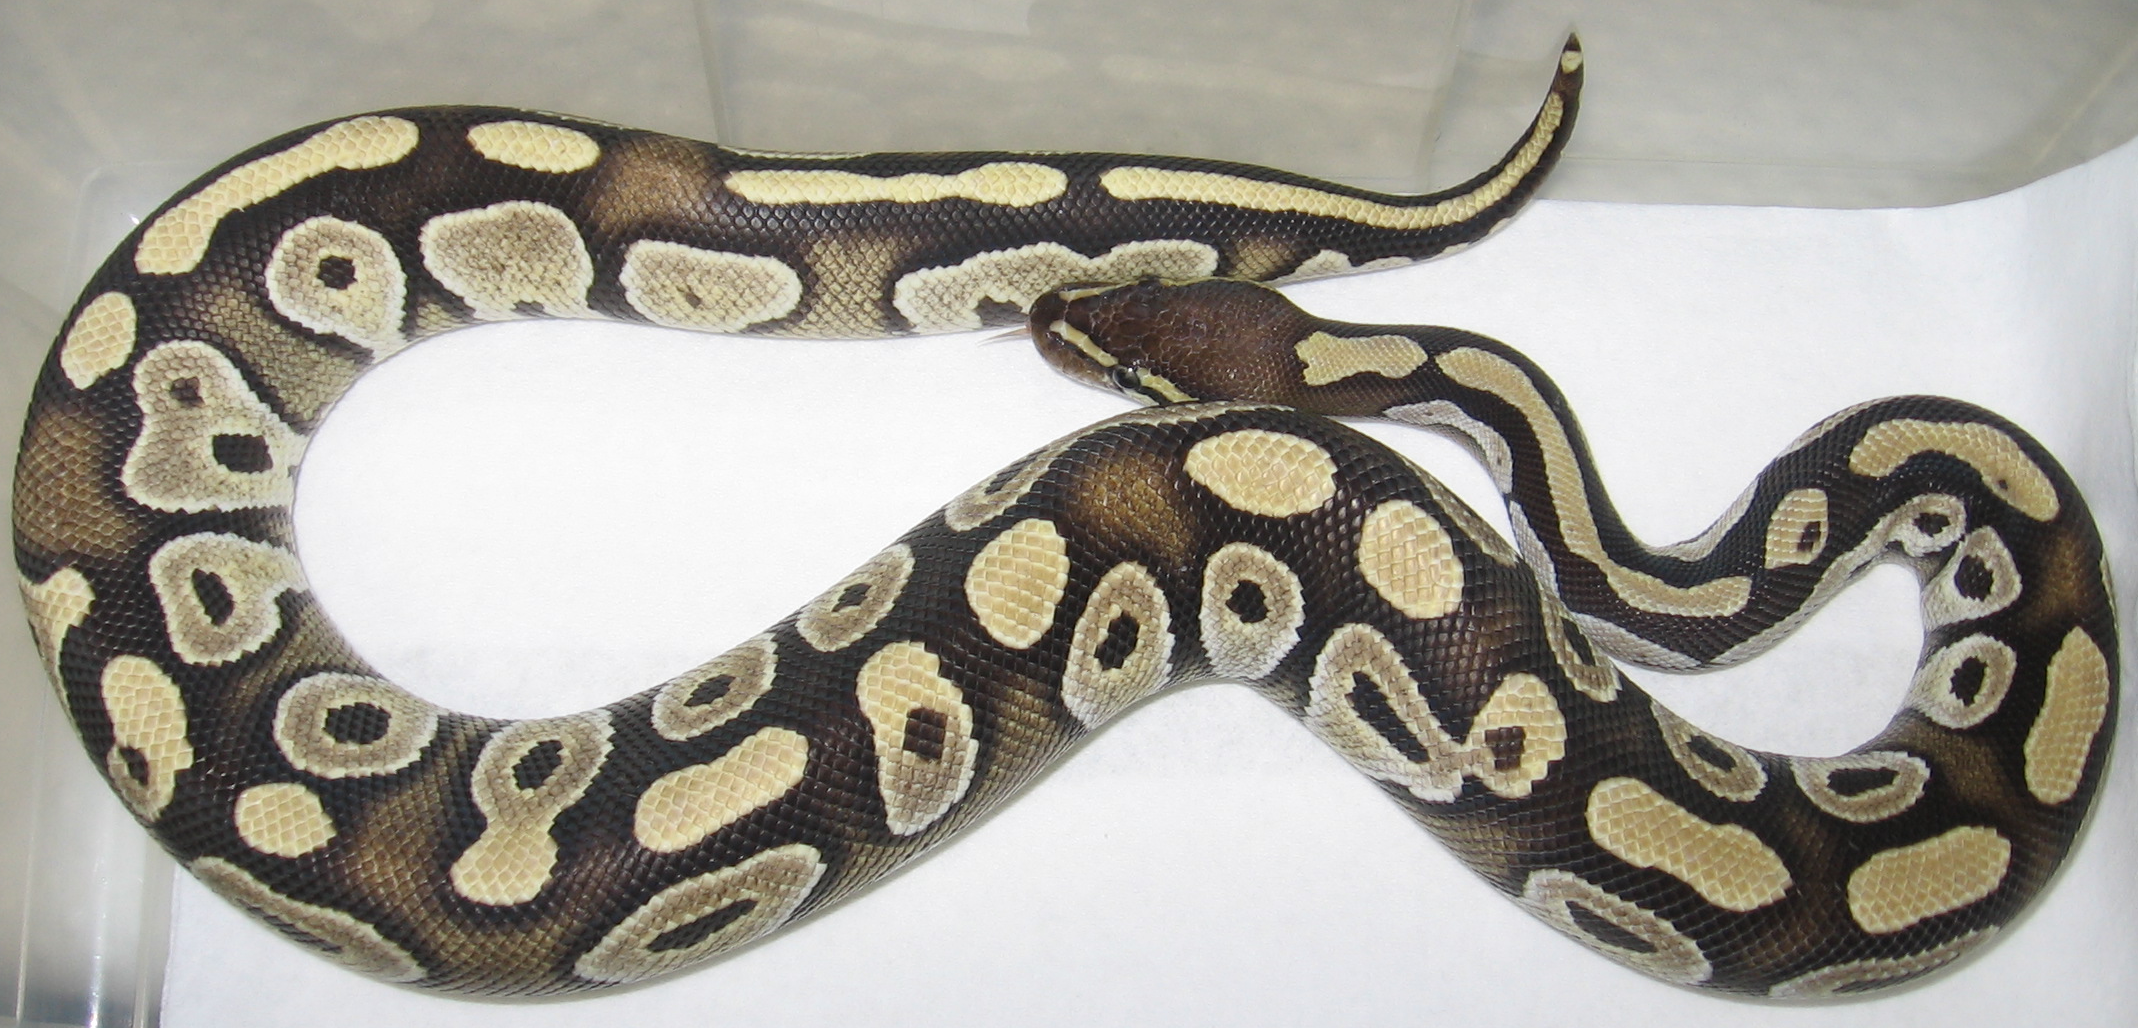 Pastel ball python full grown